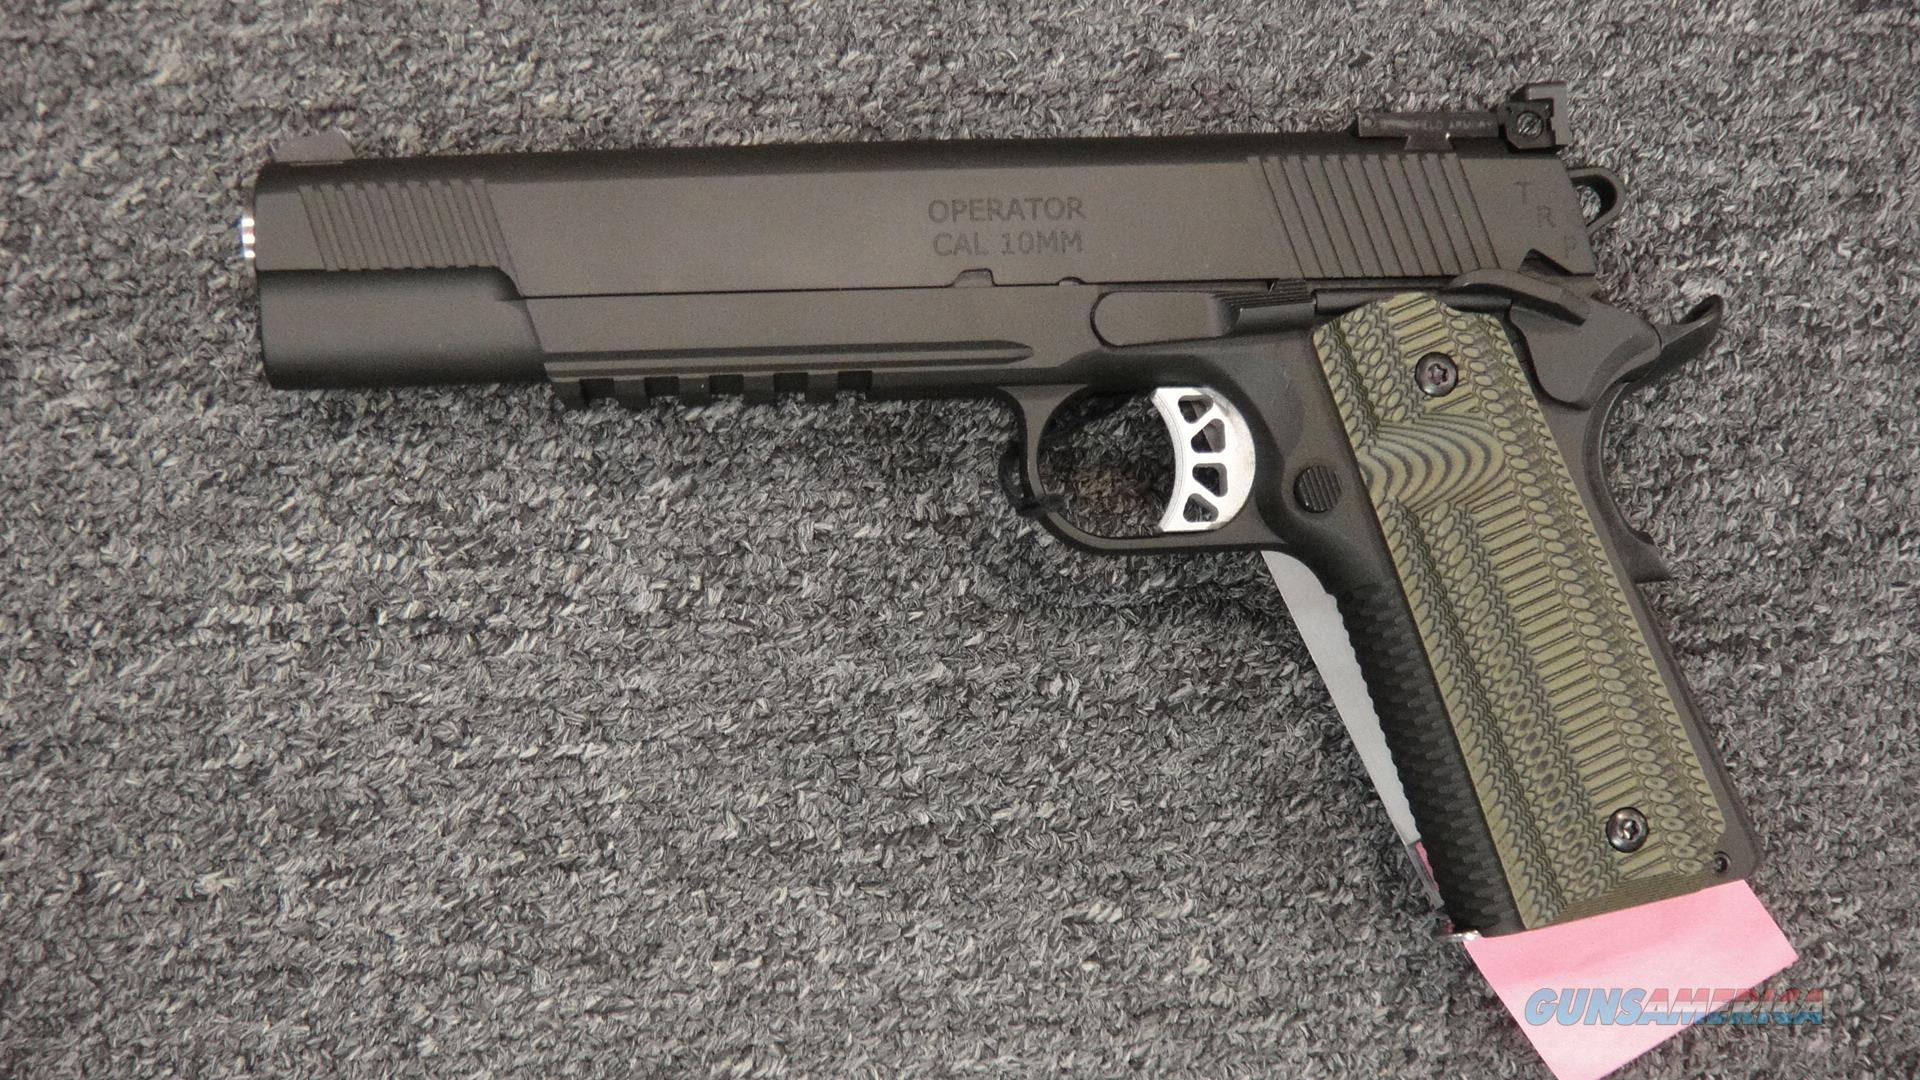 Springfield Armory TRP Heavy Operator 10mm  Guns > Pistols > Springfield Armory Pistols > 1911 Type